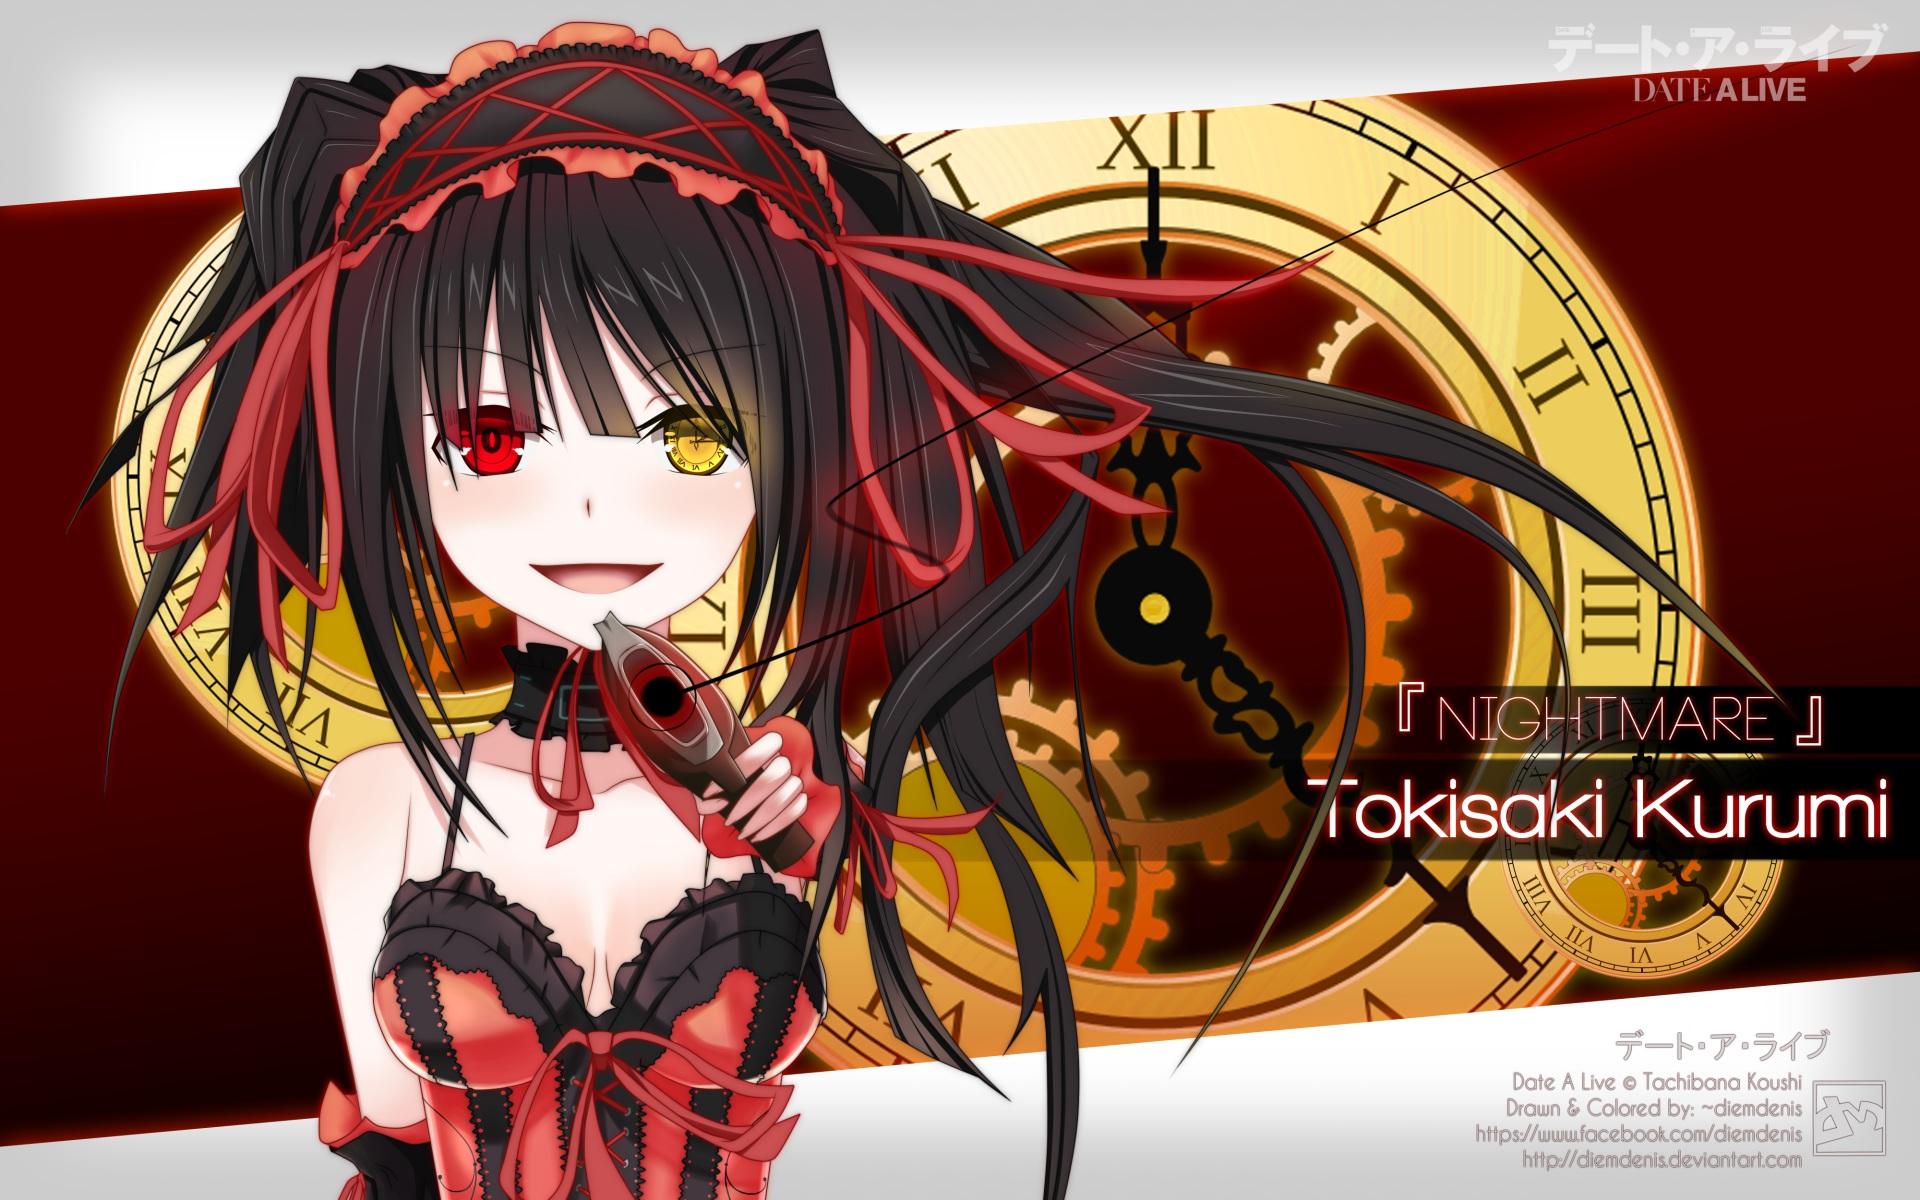 Bicolored Eyes Black Hair Date A Live Gun Tokisaki Kurumi Weapon